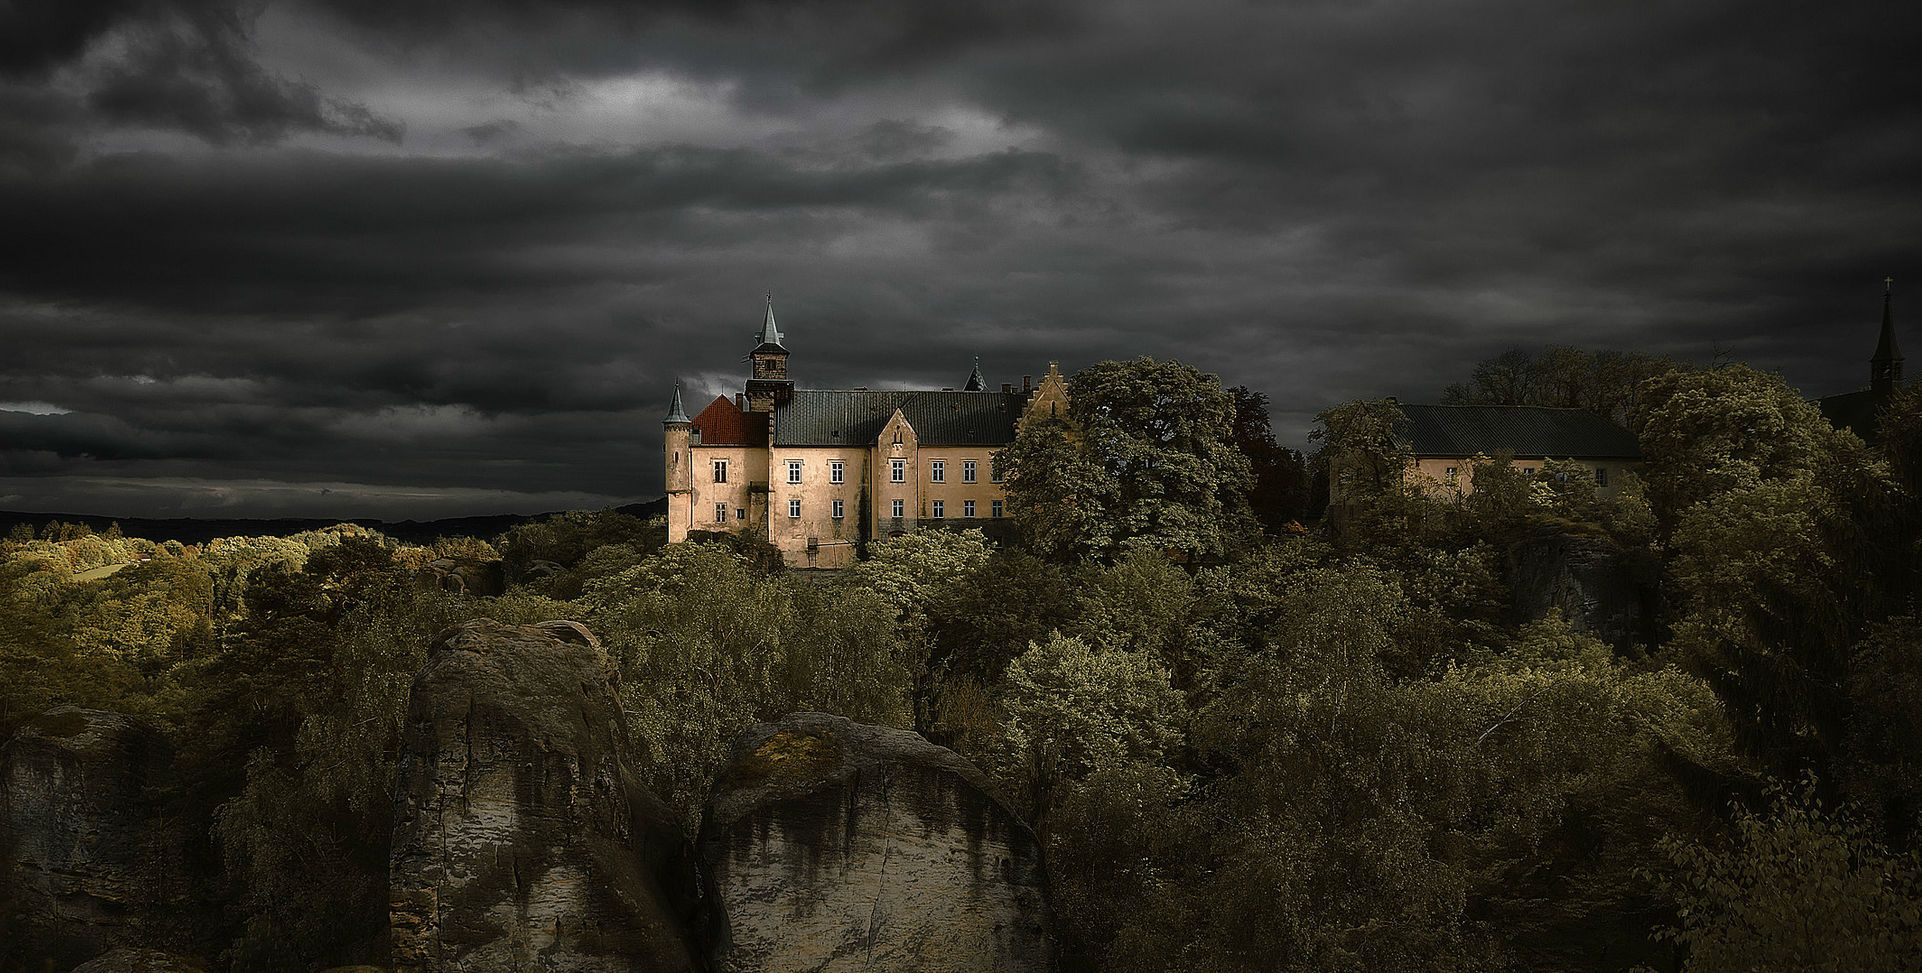 Замок Груба Скала, Чехія